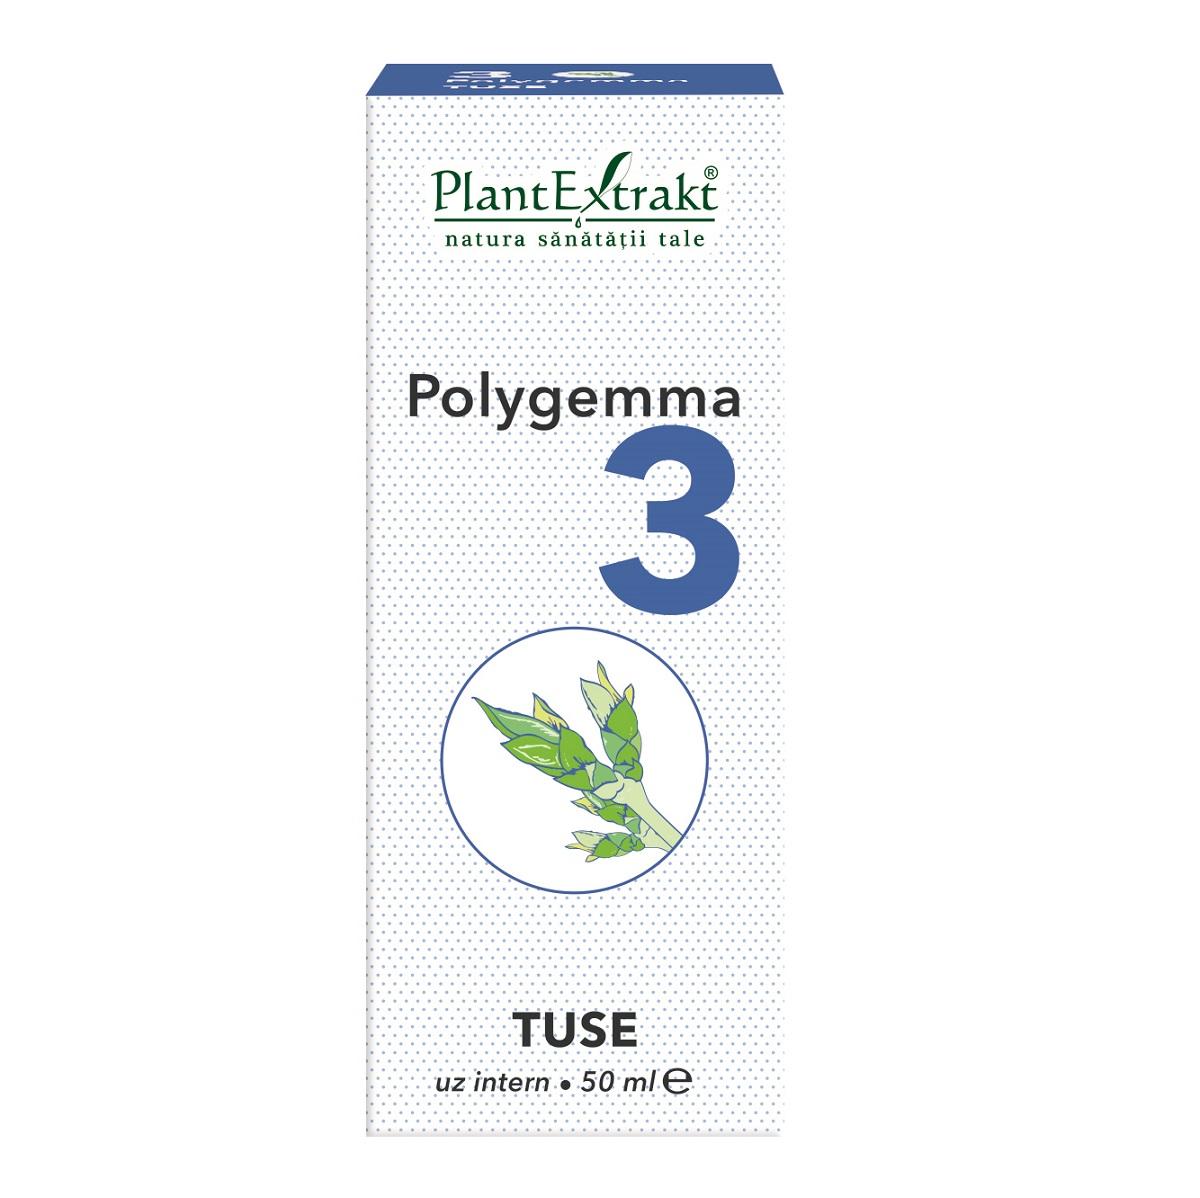 Polygemma 3 Tuse, 50ml, Plant Extrakt drmax.ro